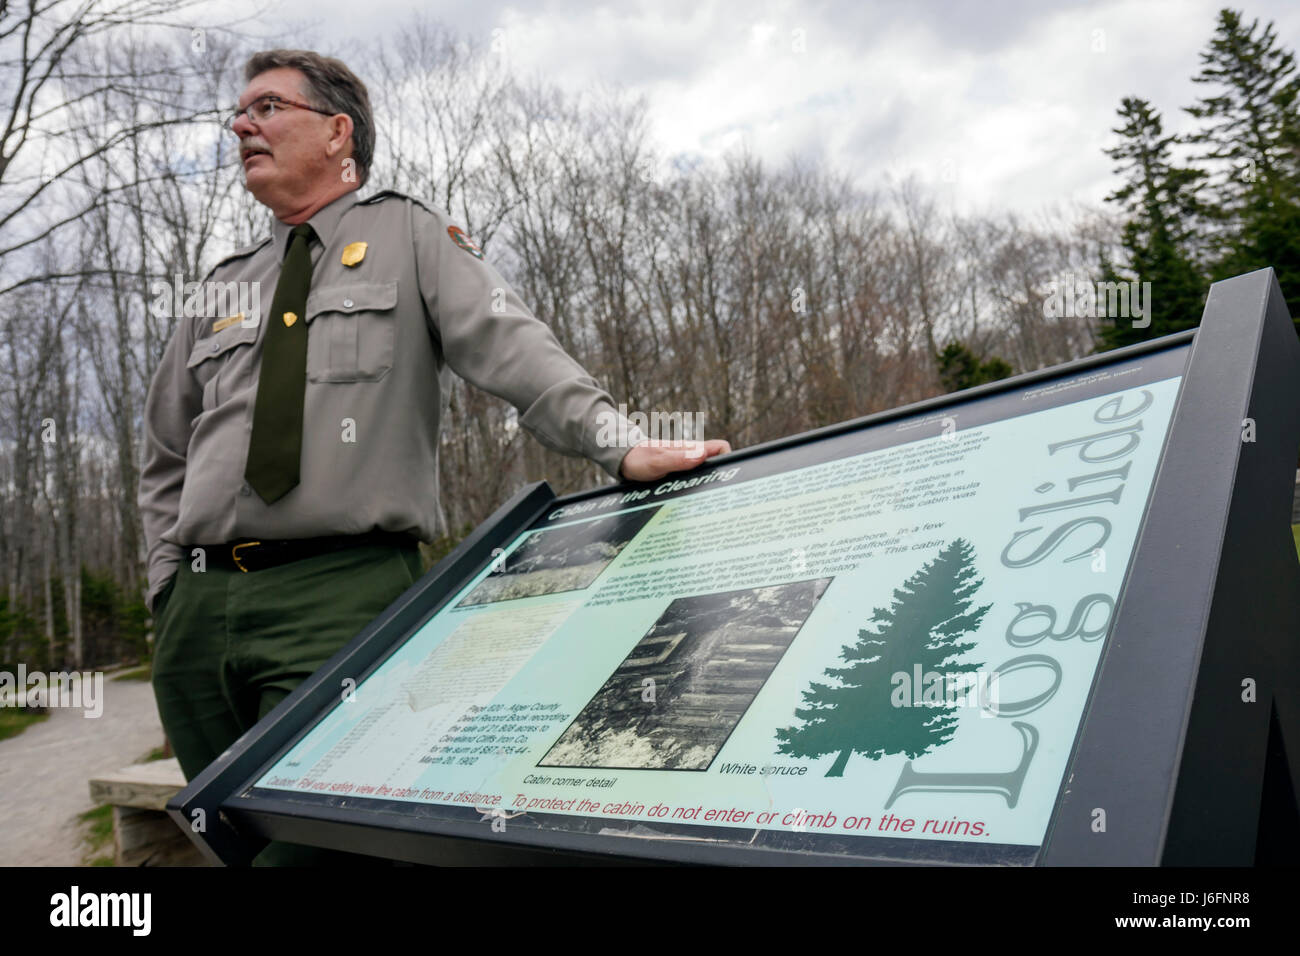 Michigan Upper Peninsula U.P. UP Lake Superior Pictured Rocks National Lakeshore Log Slide National Park Service - Stock Image